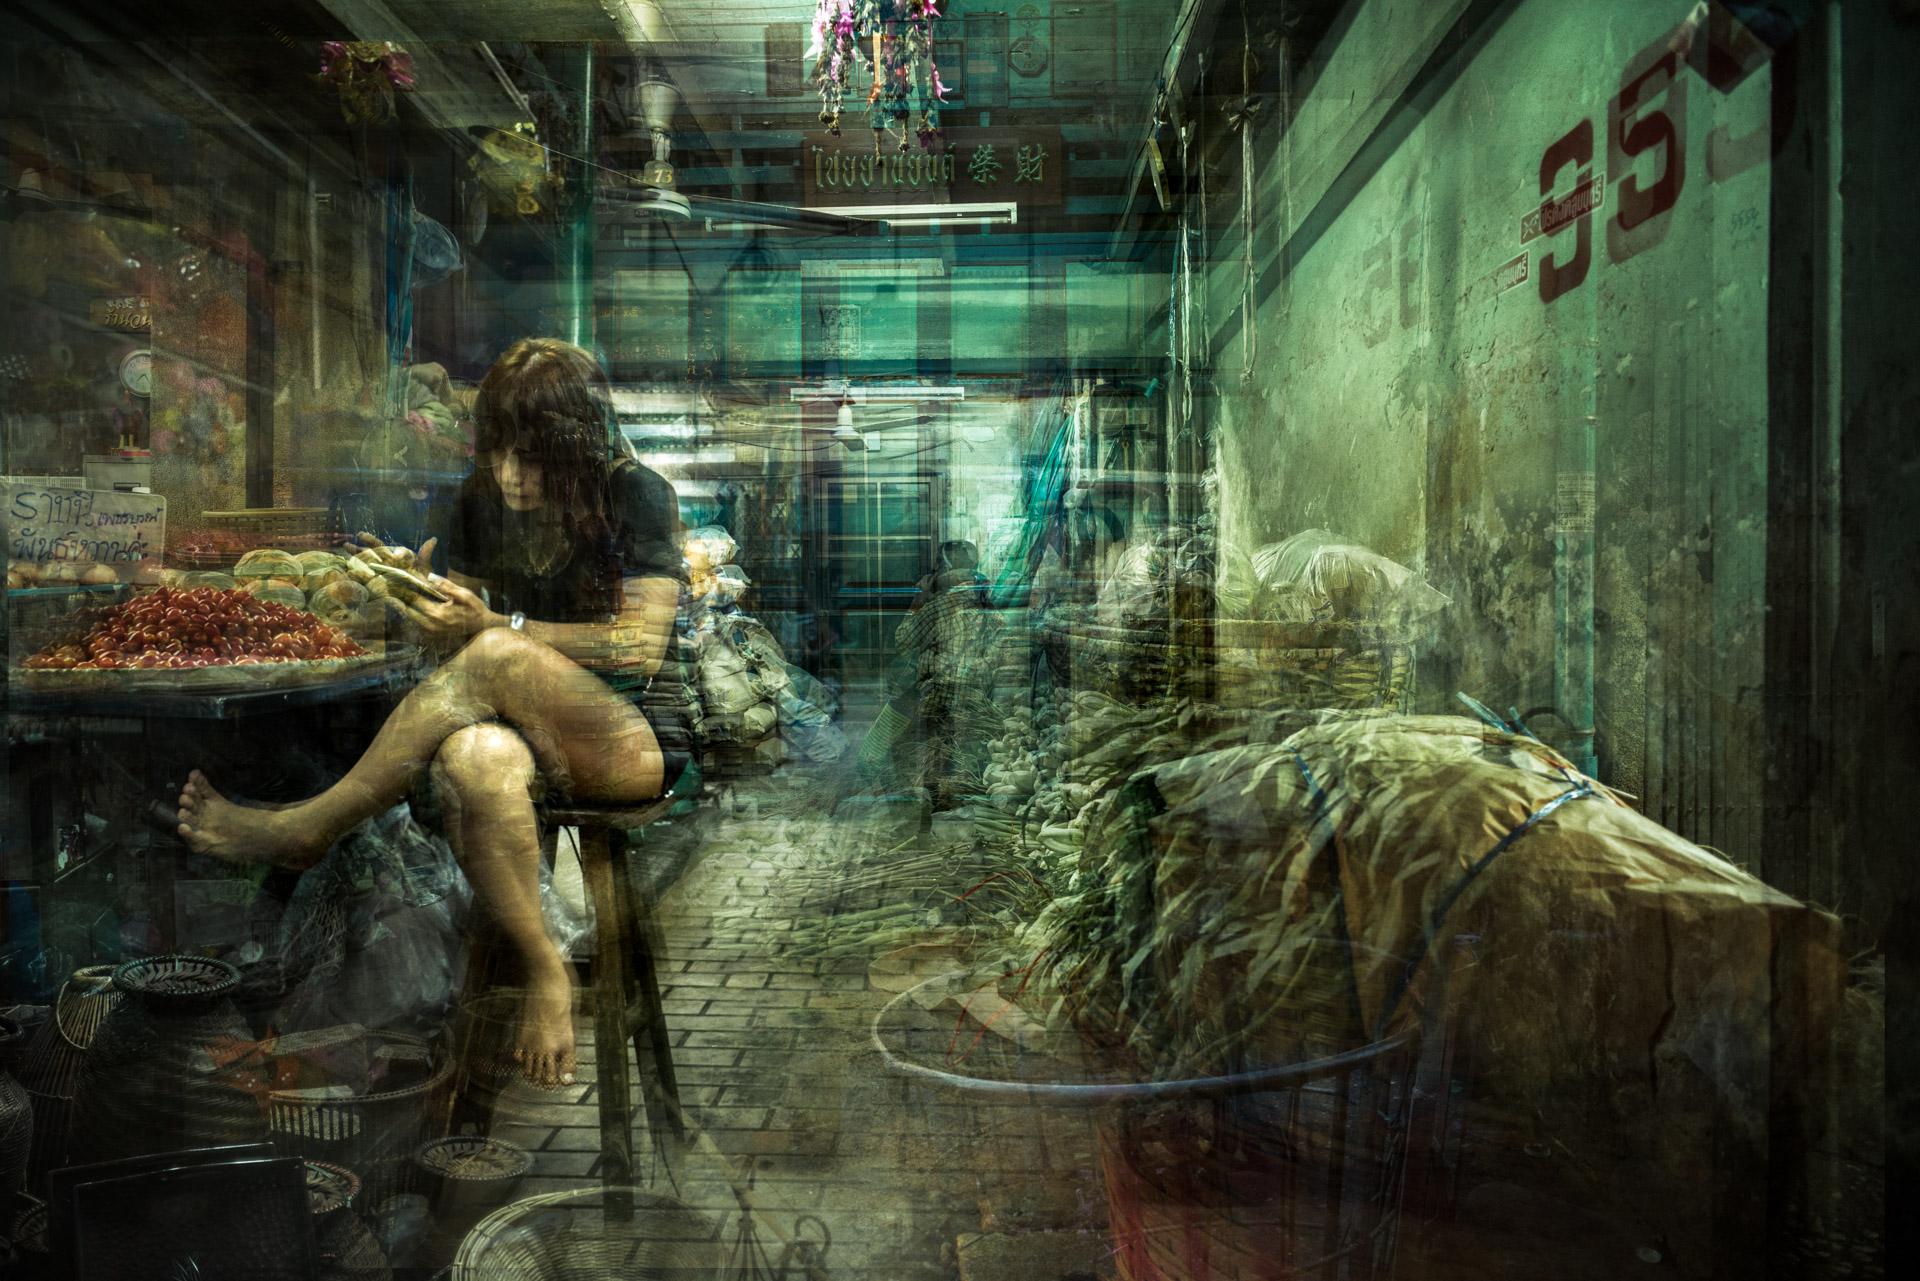 Tha Klang - Riccardo Magherini Fine Art - BKK series